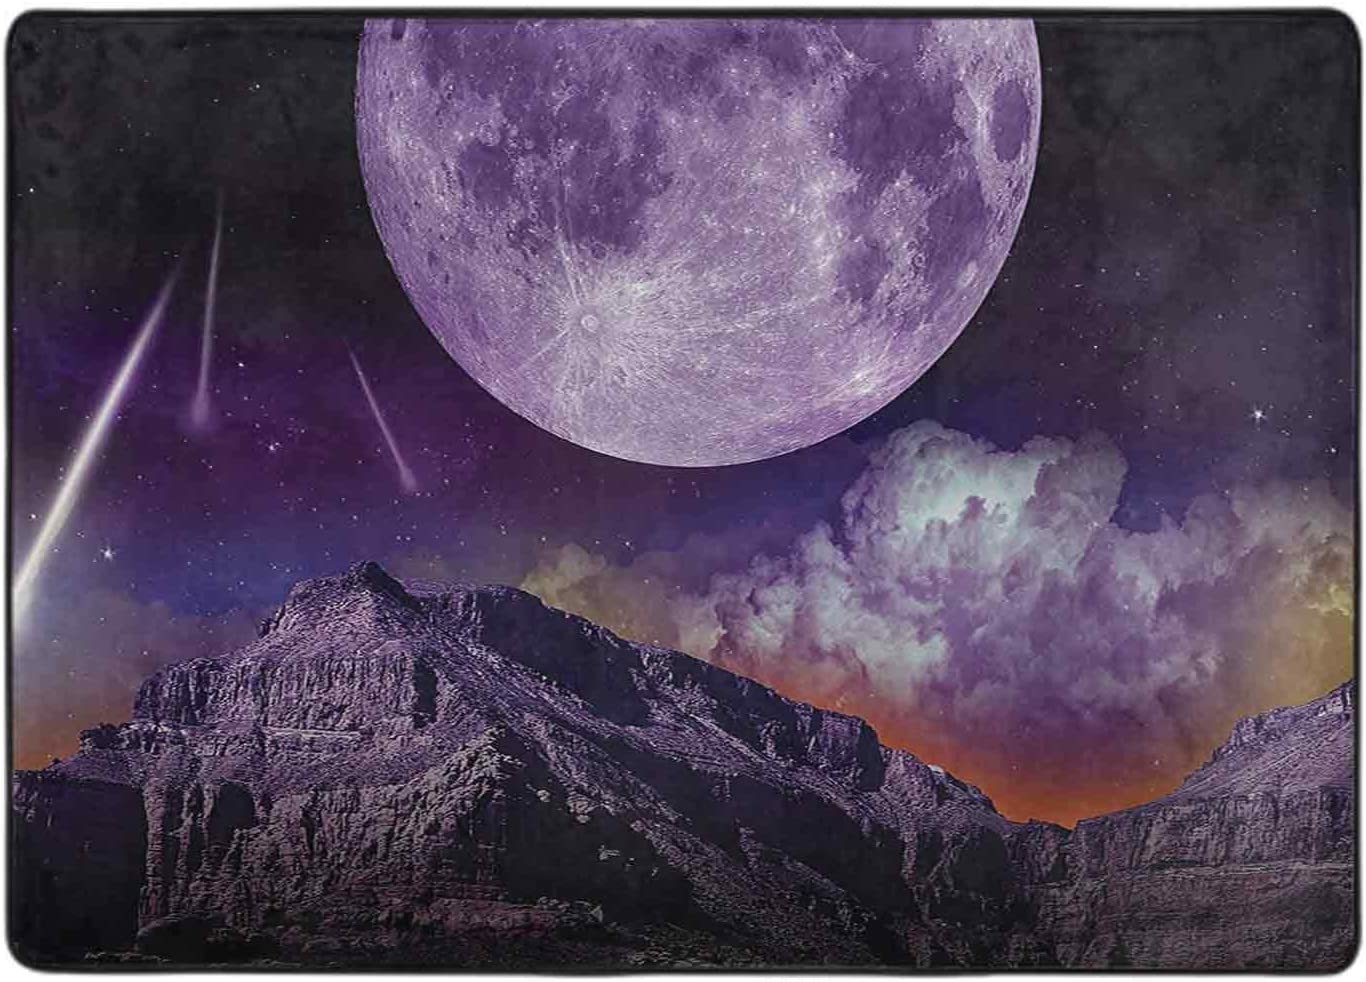 Area Rug Bedroom Fantasy SEAL limited product Dark Night Cosmos New popularity Earth in Plan Galaxy